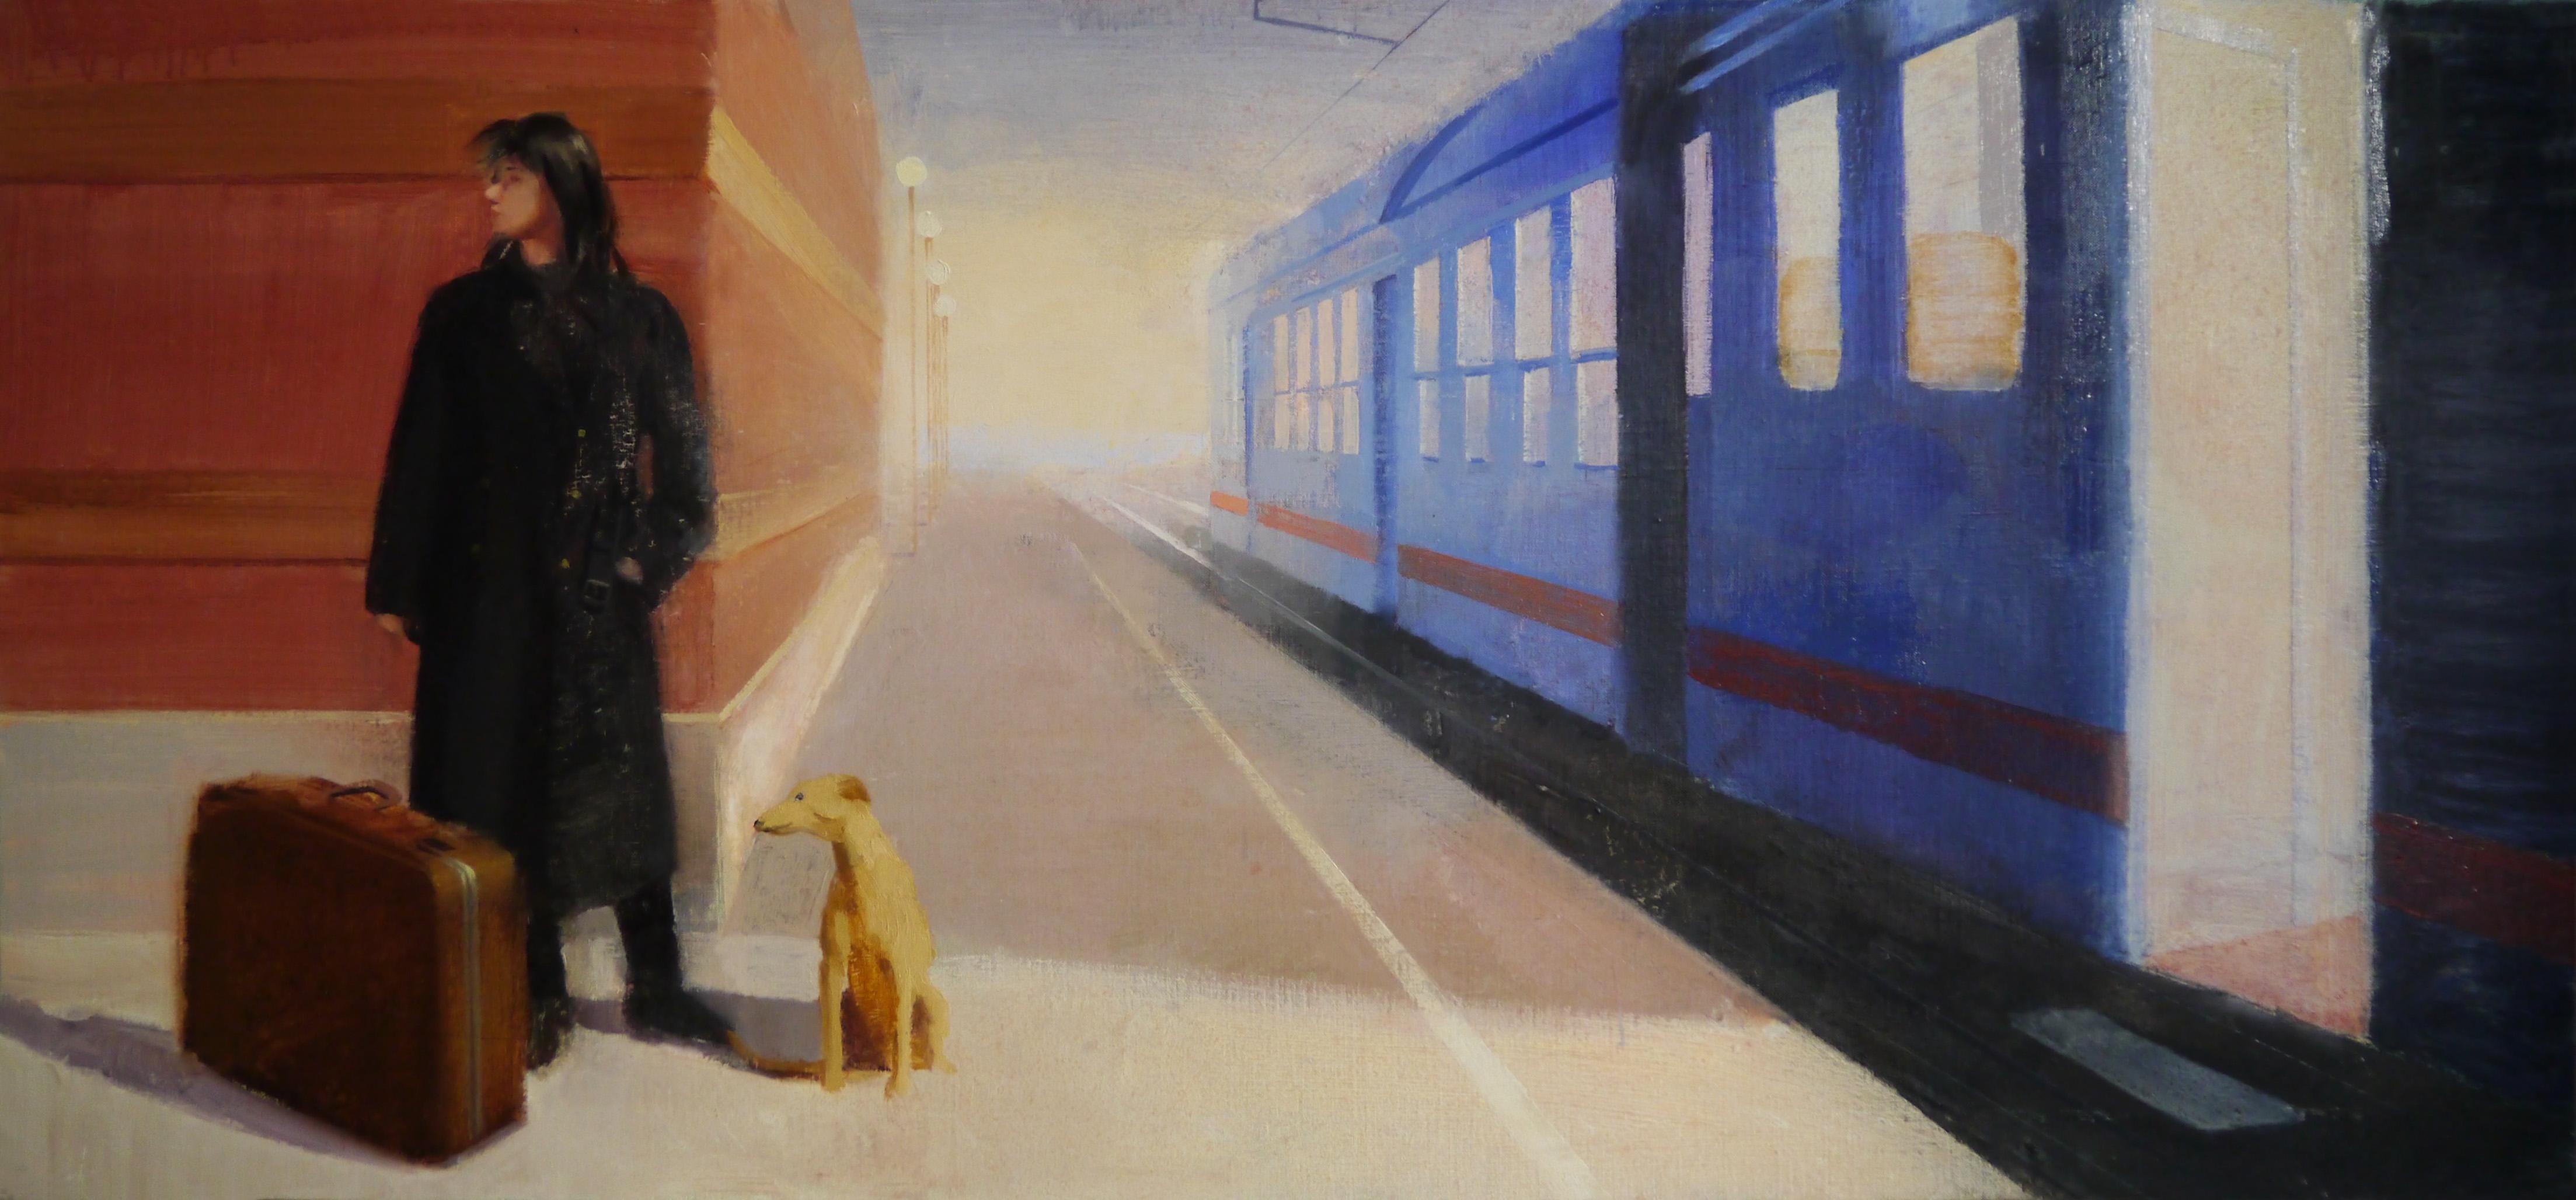 pasajeros-al-tren-estación-viaje-mujer-esperando-maleta-perro-alejandra-caballero-